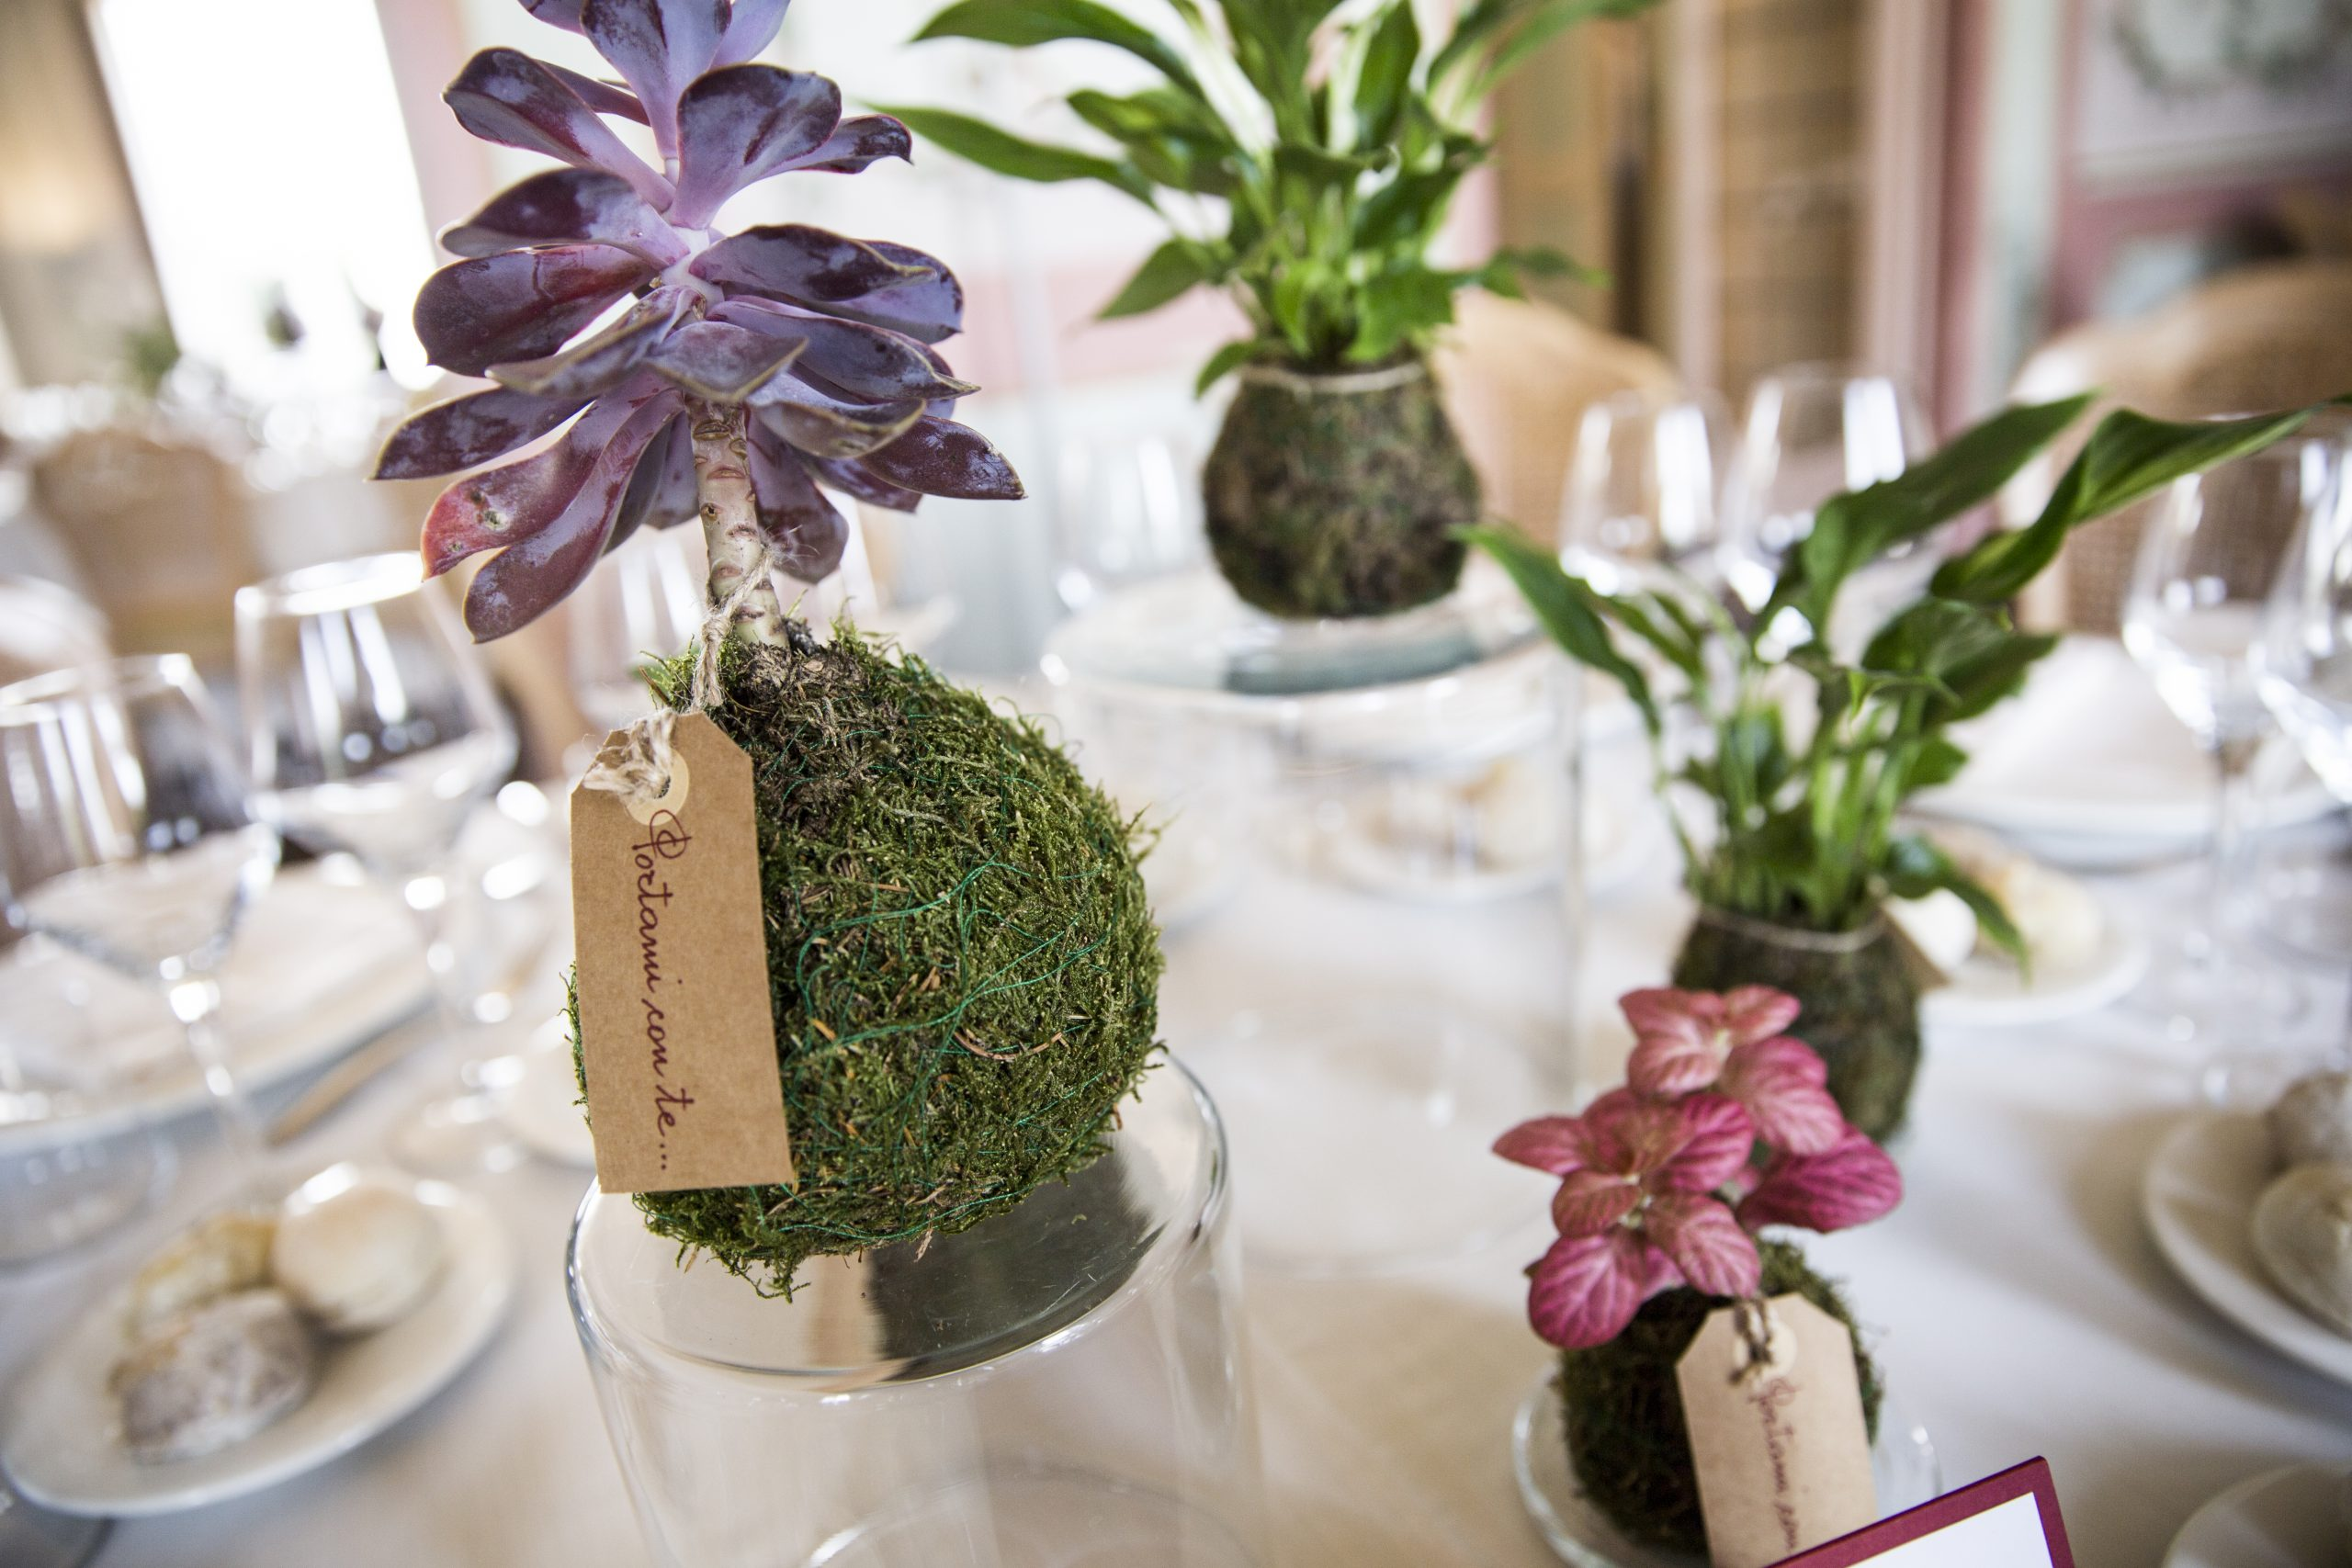 Matrimonio in Marsala e Verde-9 Antonella Amato Wedding Planner